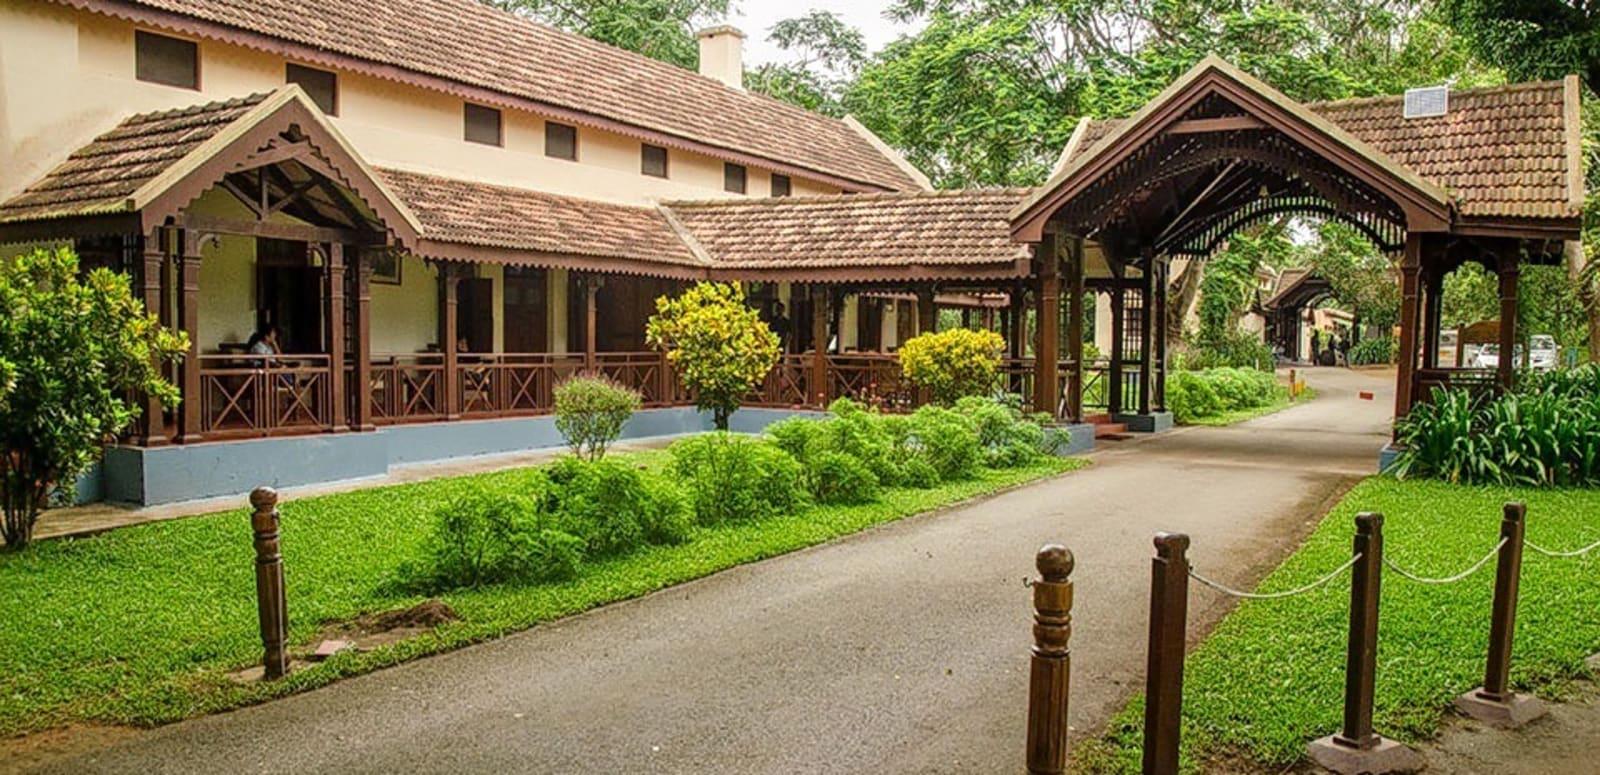 Kabini River Lodge - Mysore Image